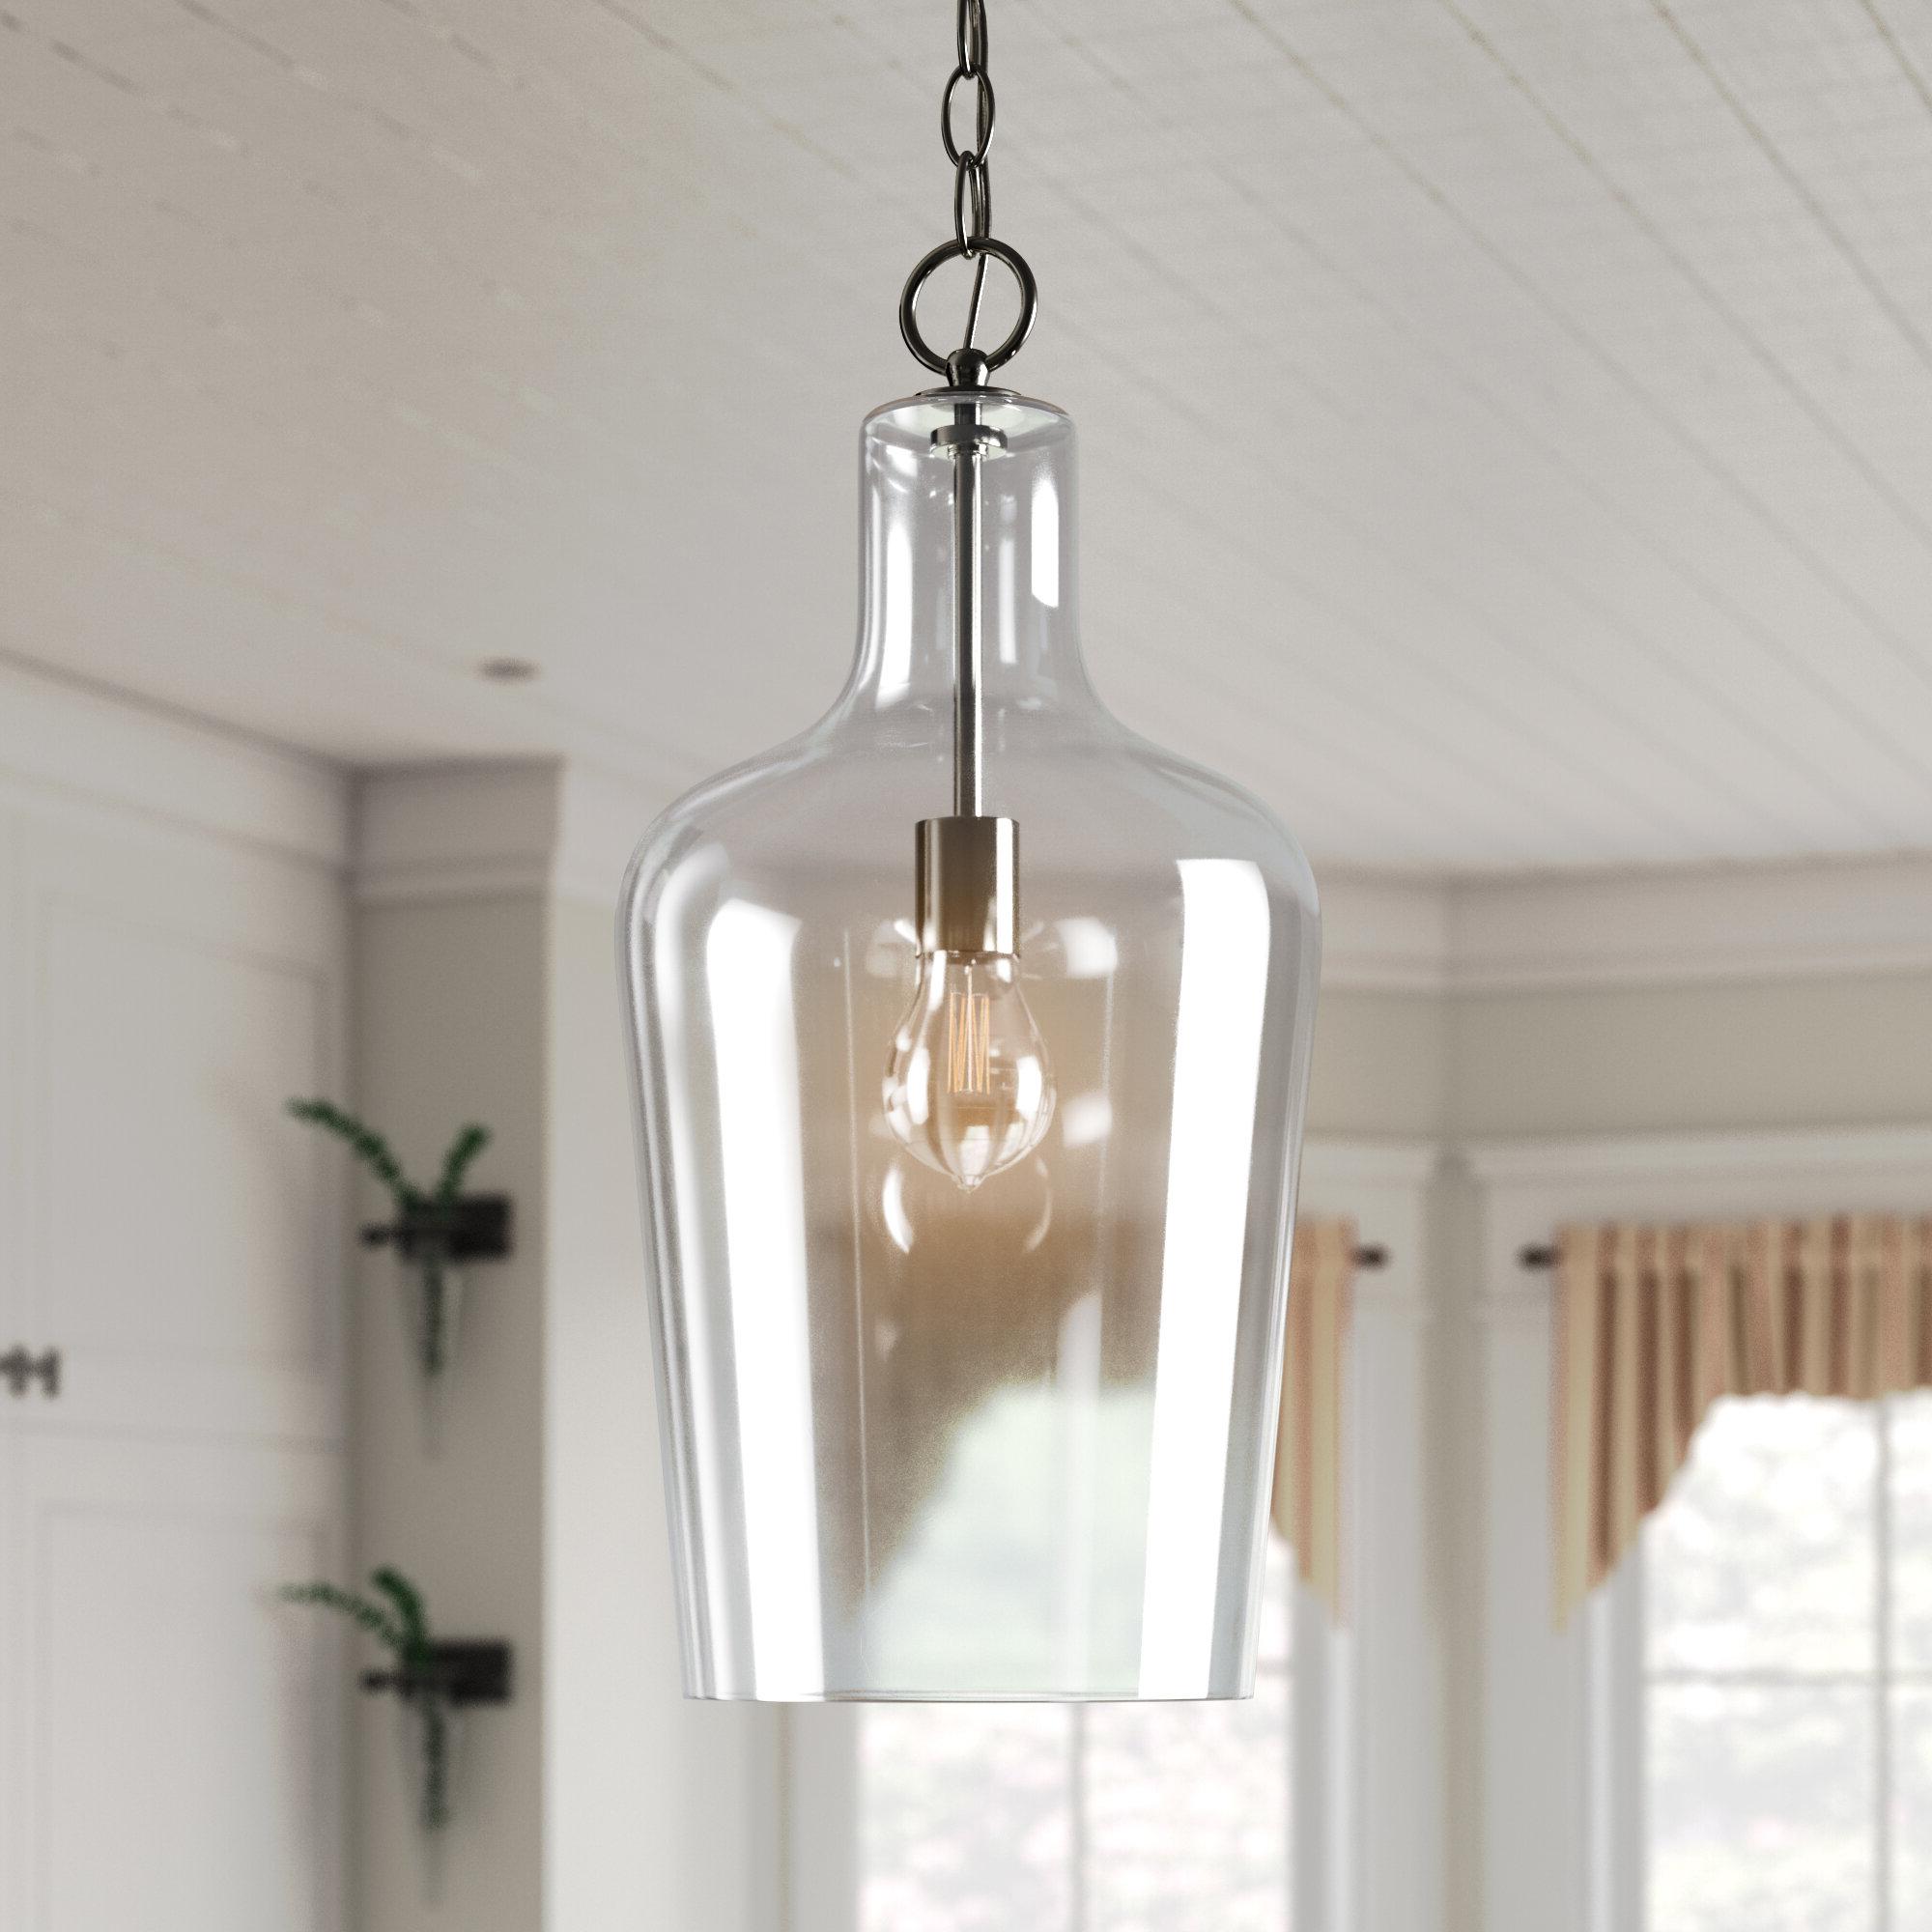 Laurel Foundry Modern Farmhouse Carey 1 Light Single Bell Pendant Regarding Most Current Carey 1 Light Single Bell Pendants (View 15 of 25)